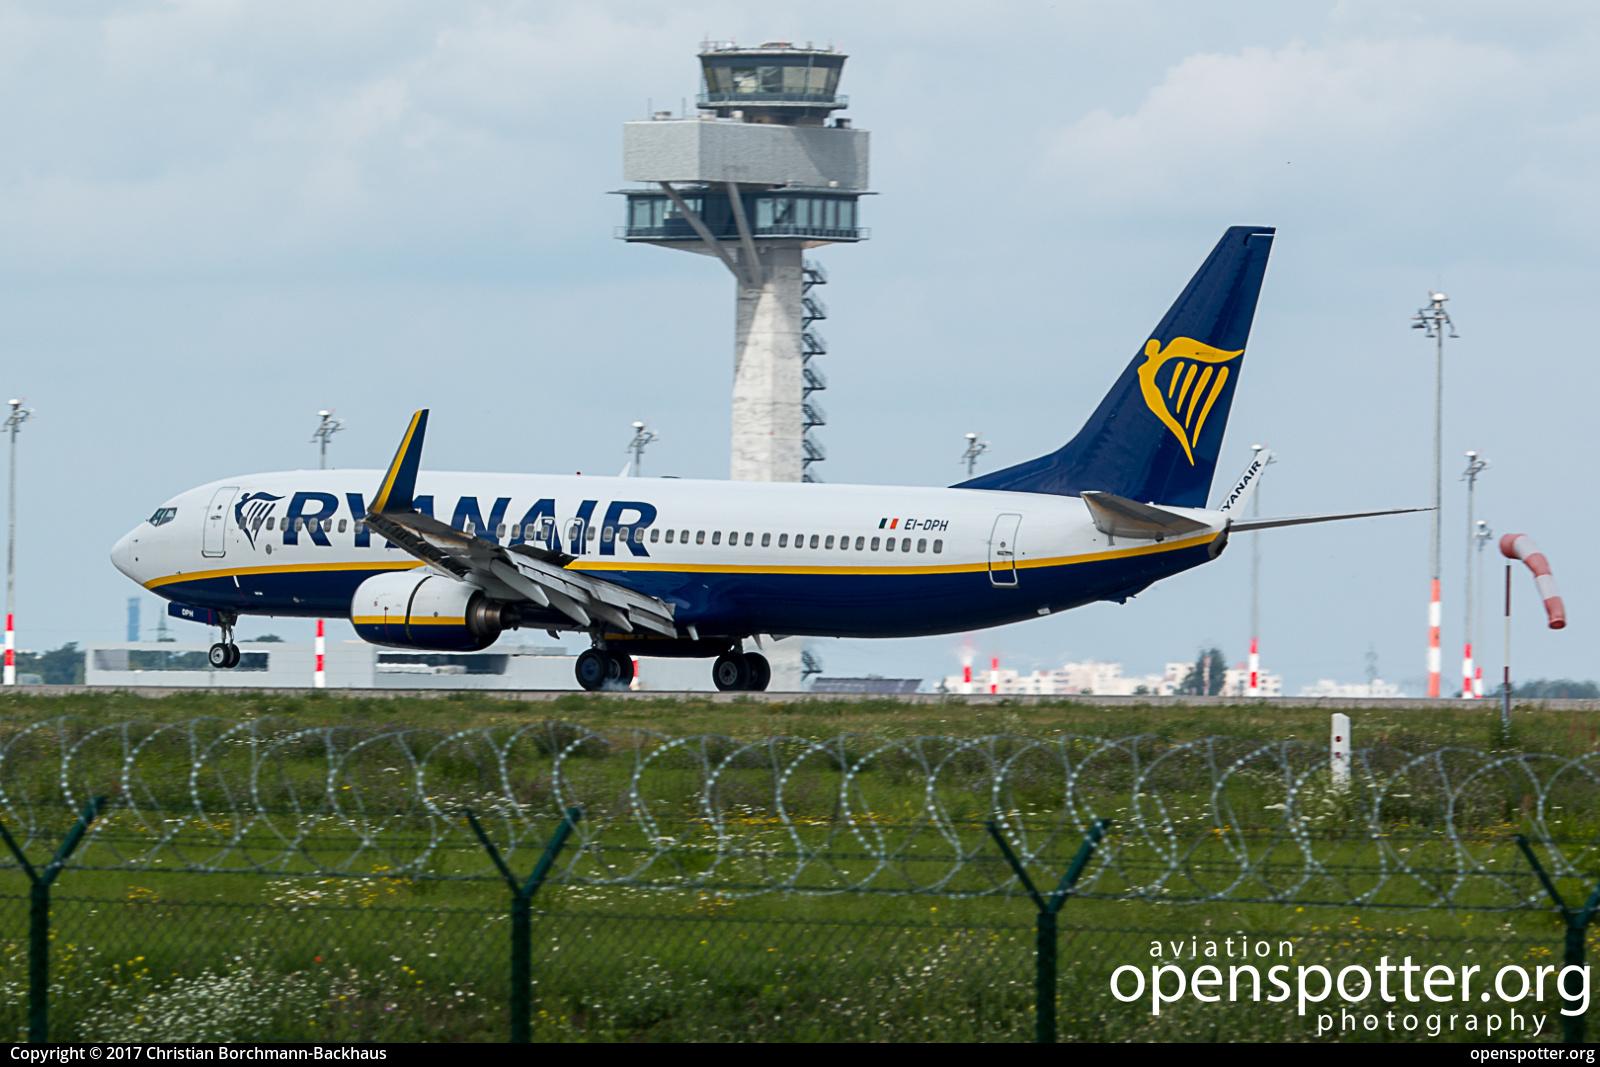 EI-DPH - Ryanair Boeing 737-8AS(WL) at Berlin-Schönefeld International Airport (SXF/EDDB) taken by Christian Borchmann-Backhaus | openspotter.org | ID: 44504